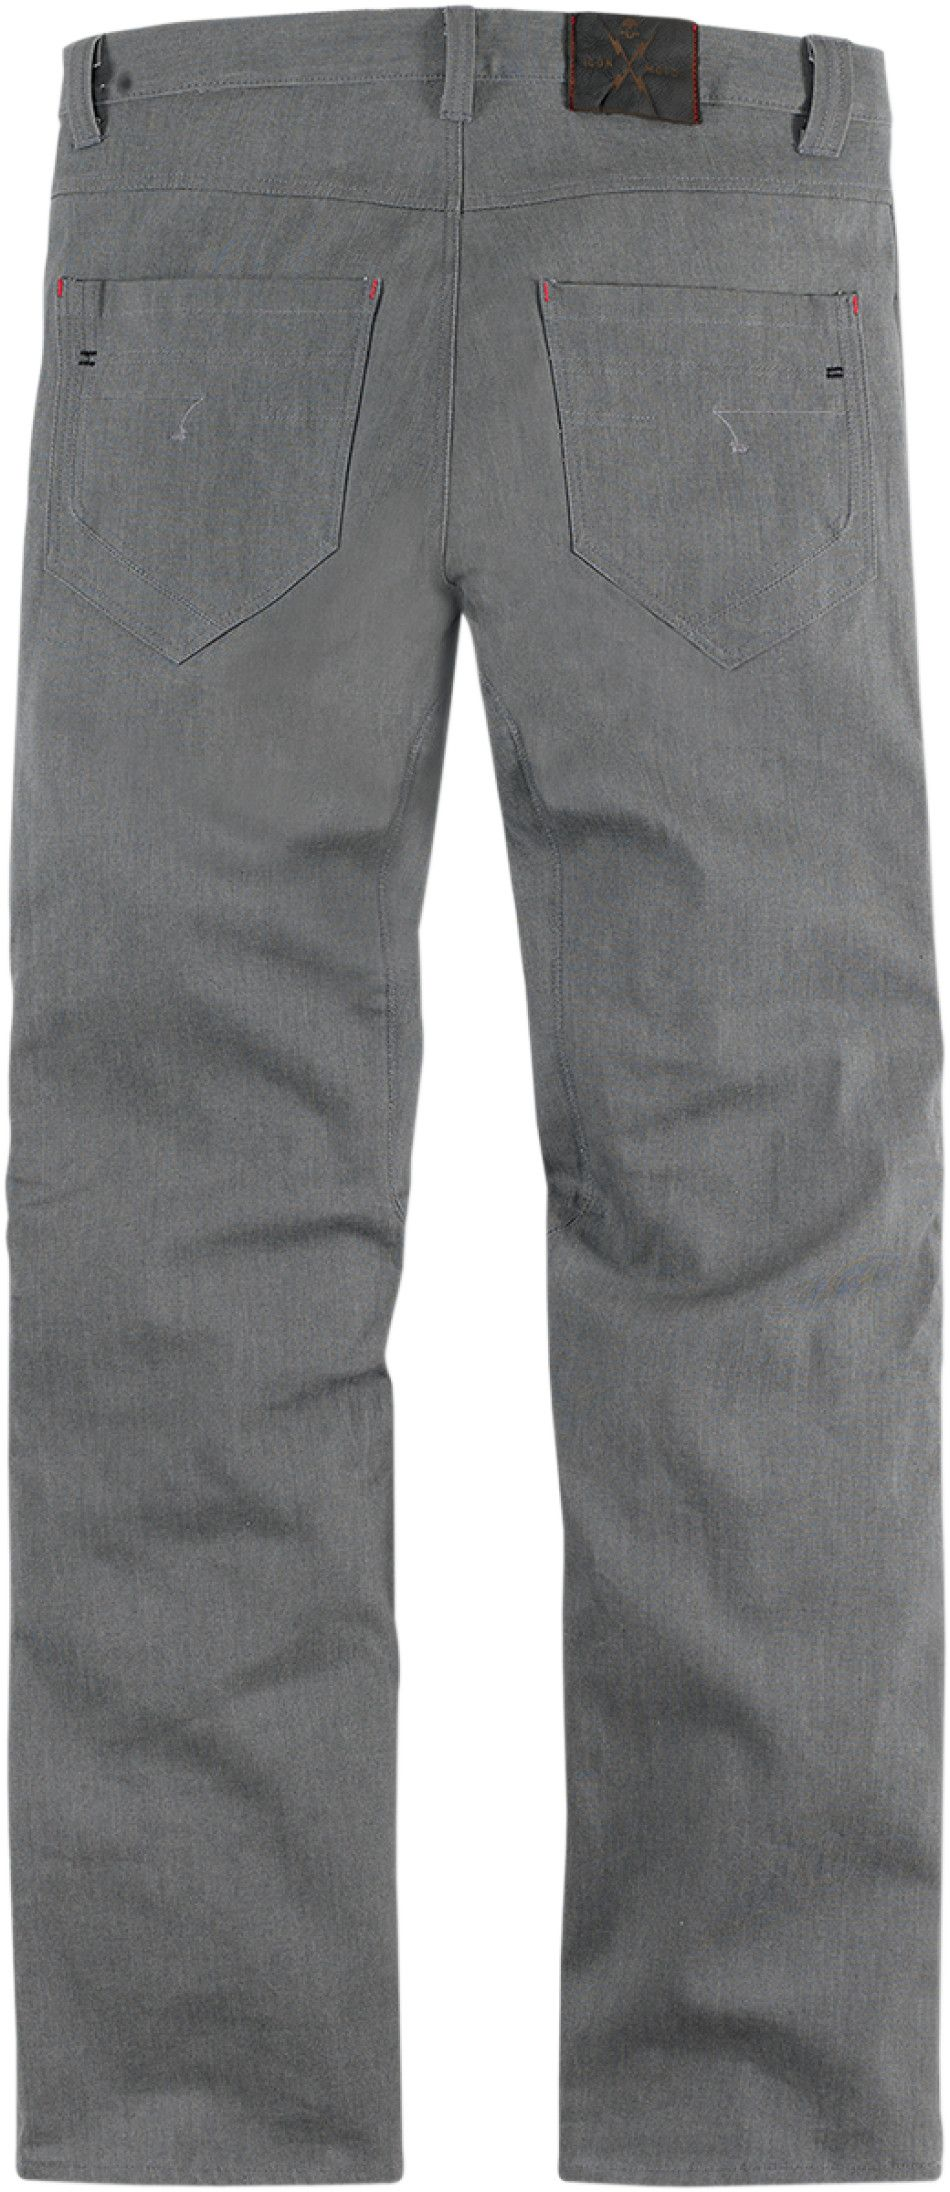 【ICON】褲子 PANT HOOLIGAN GRAY - 「Webike-摩托百貨」